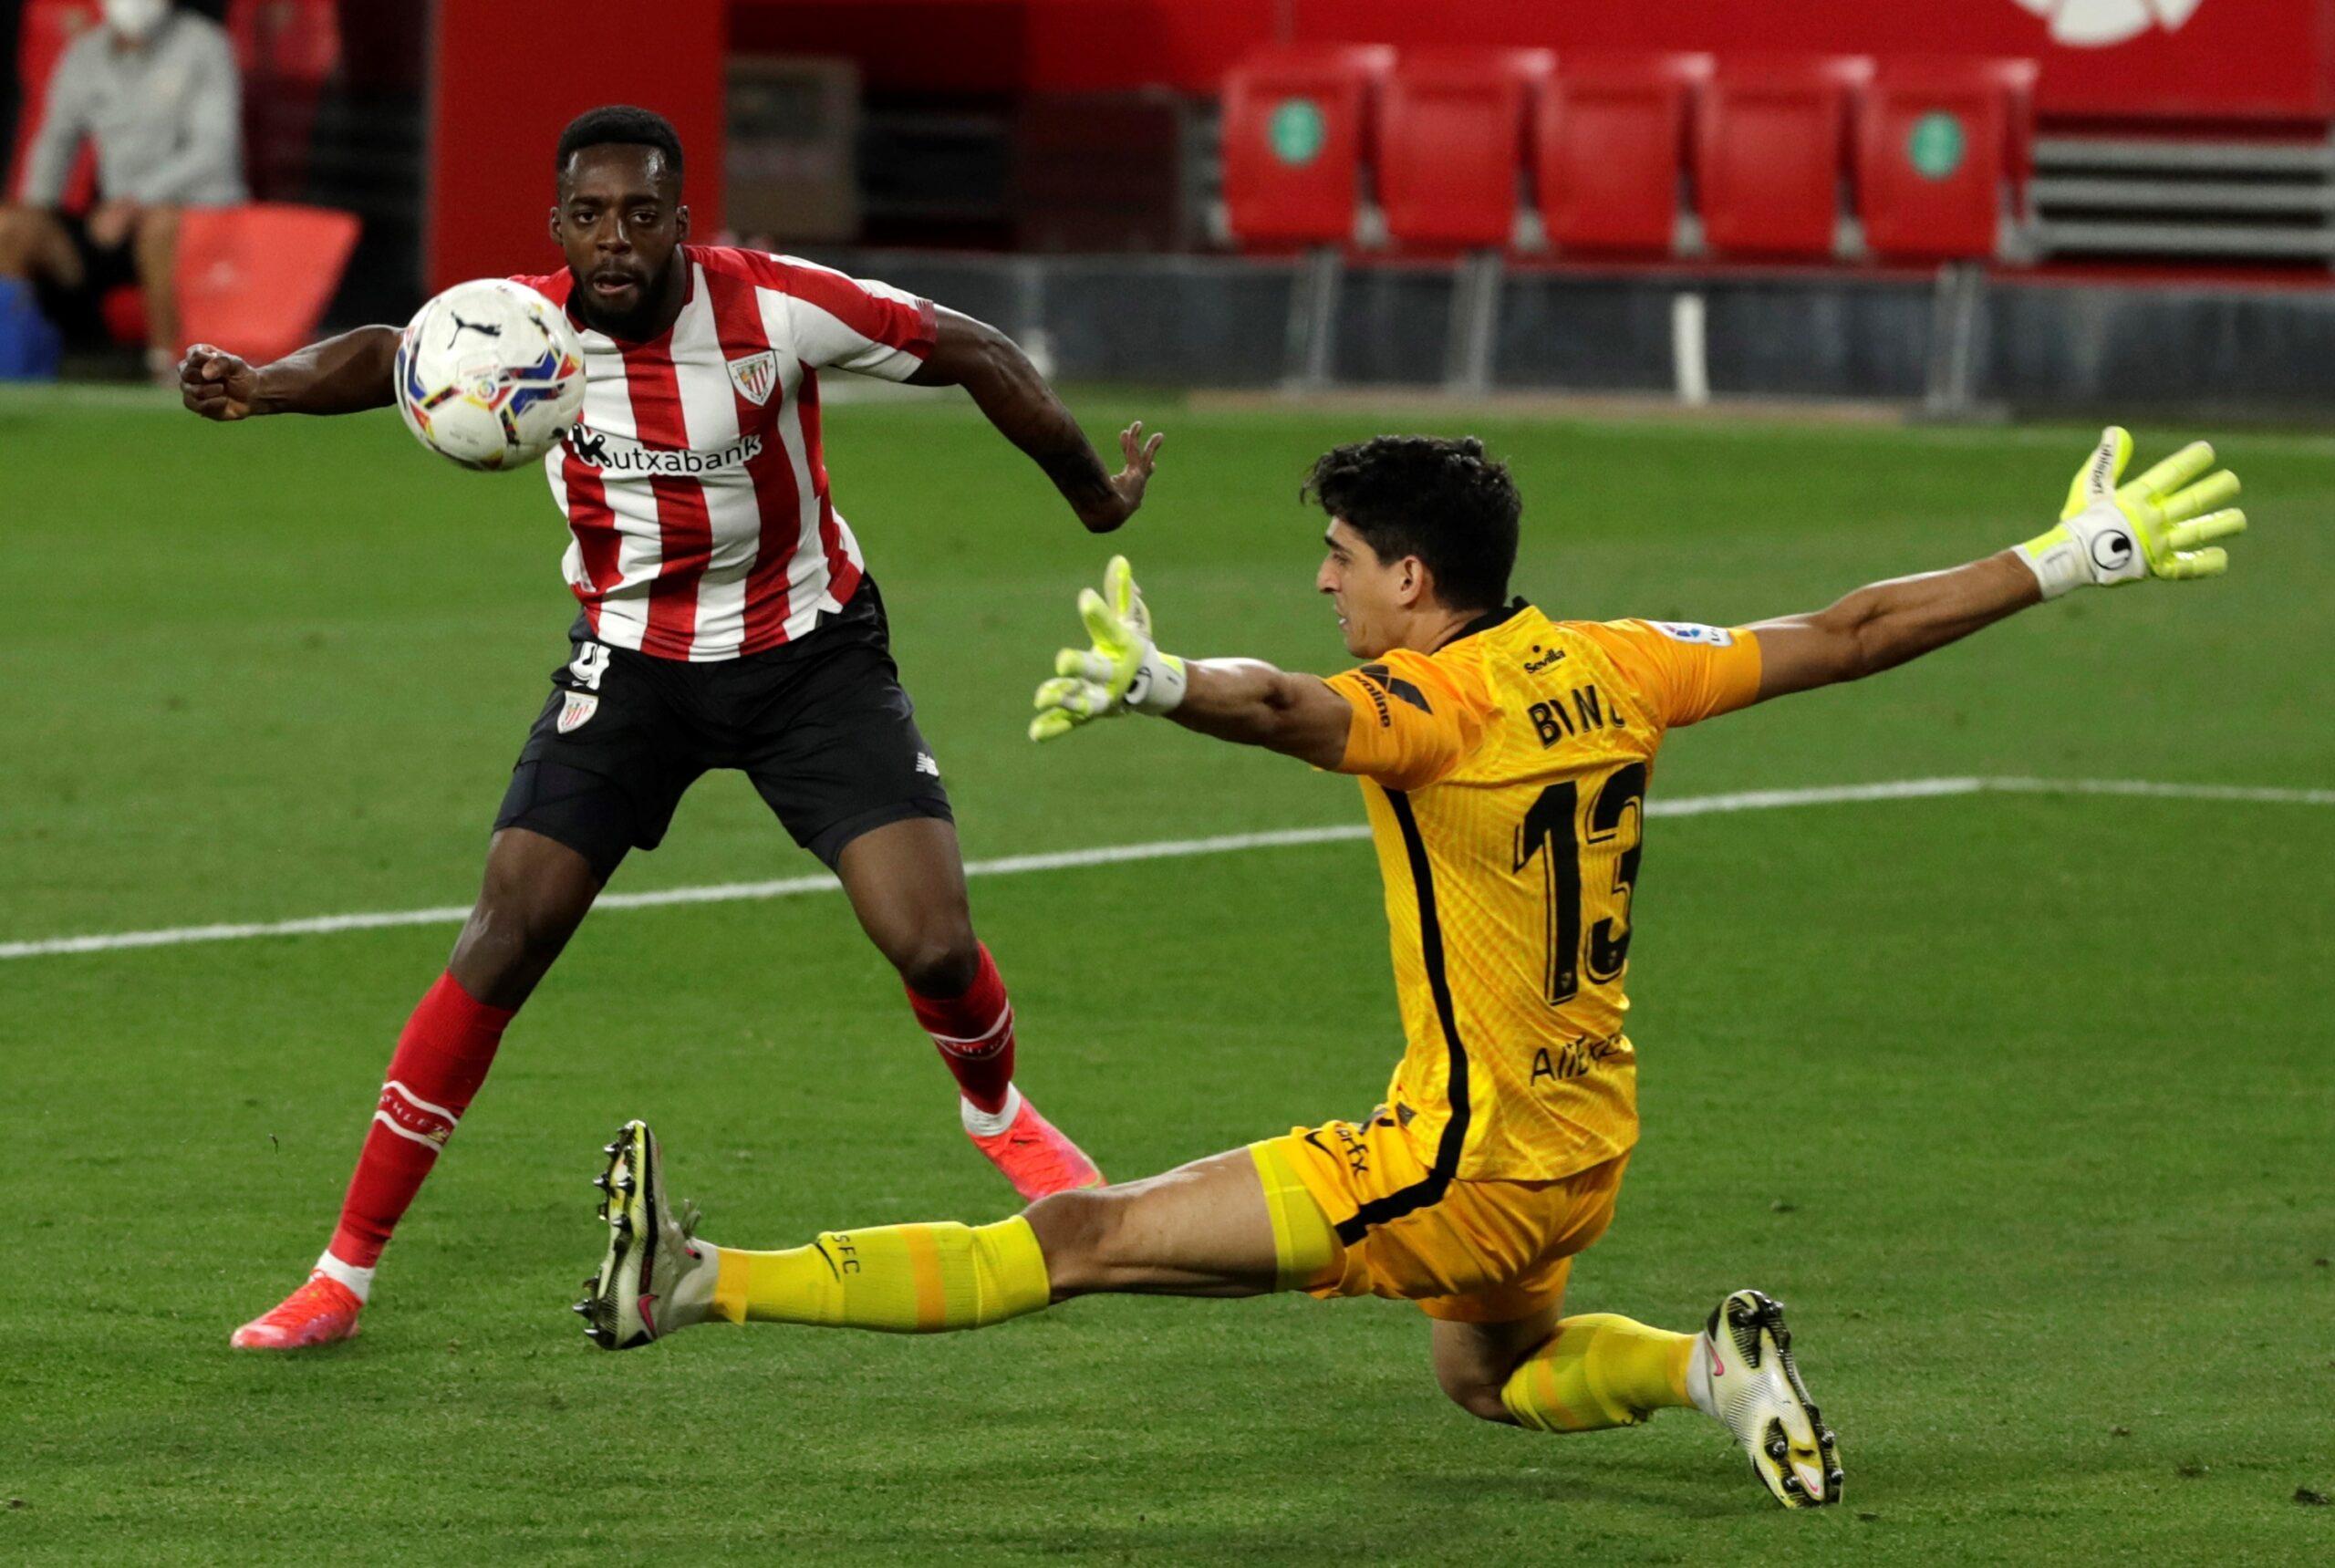 Le gardien marocain du FC Séville a craqué en fin de partie devant Inaki Williams.